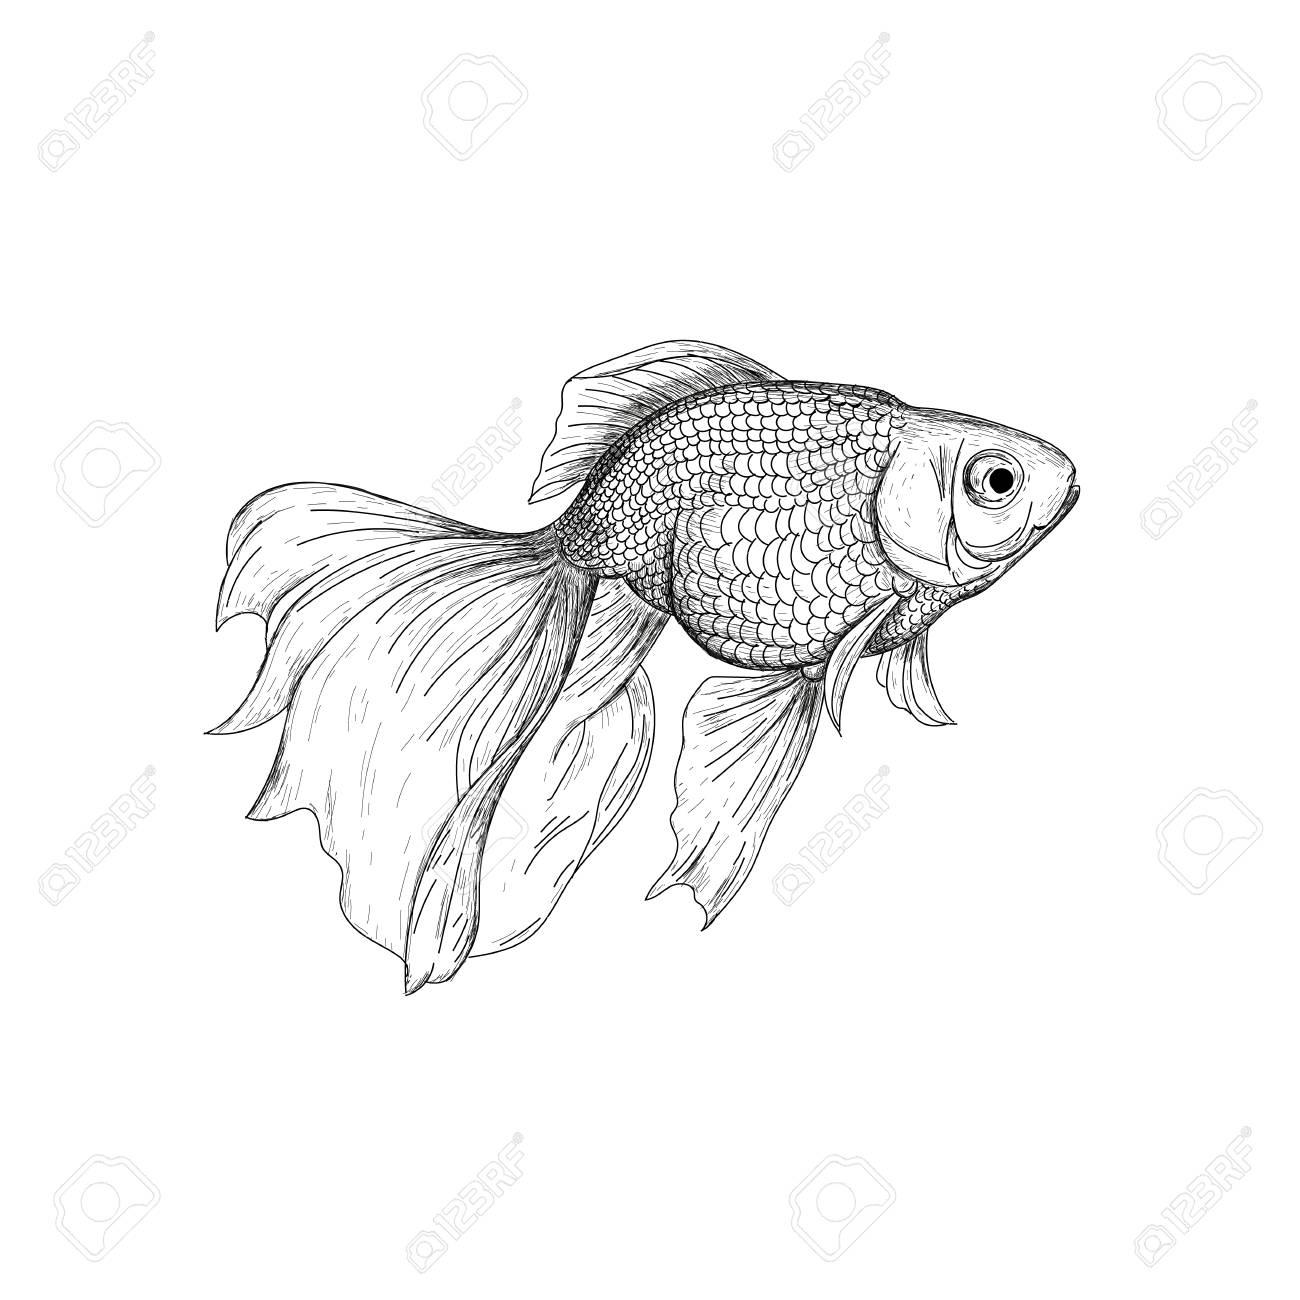 Goldfish illustration drawing engraving ink line art vector fish sketch